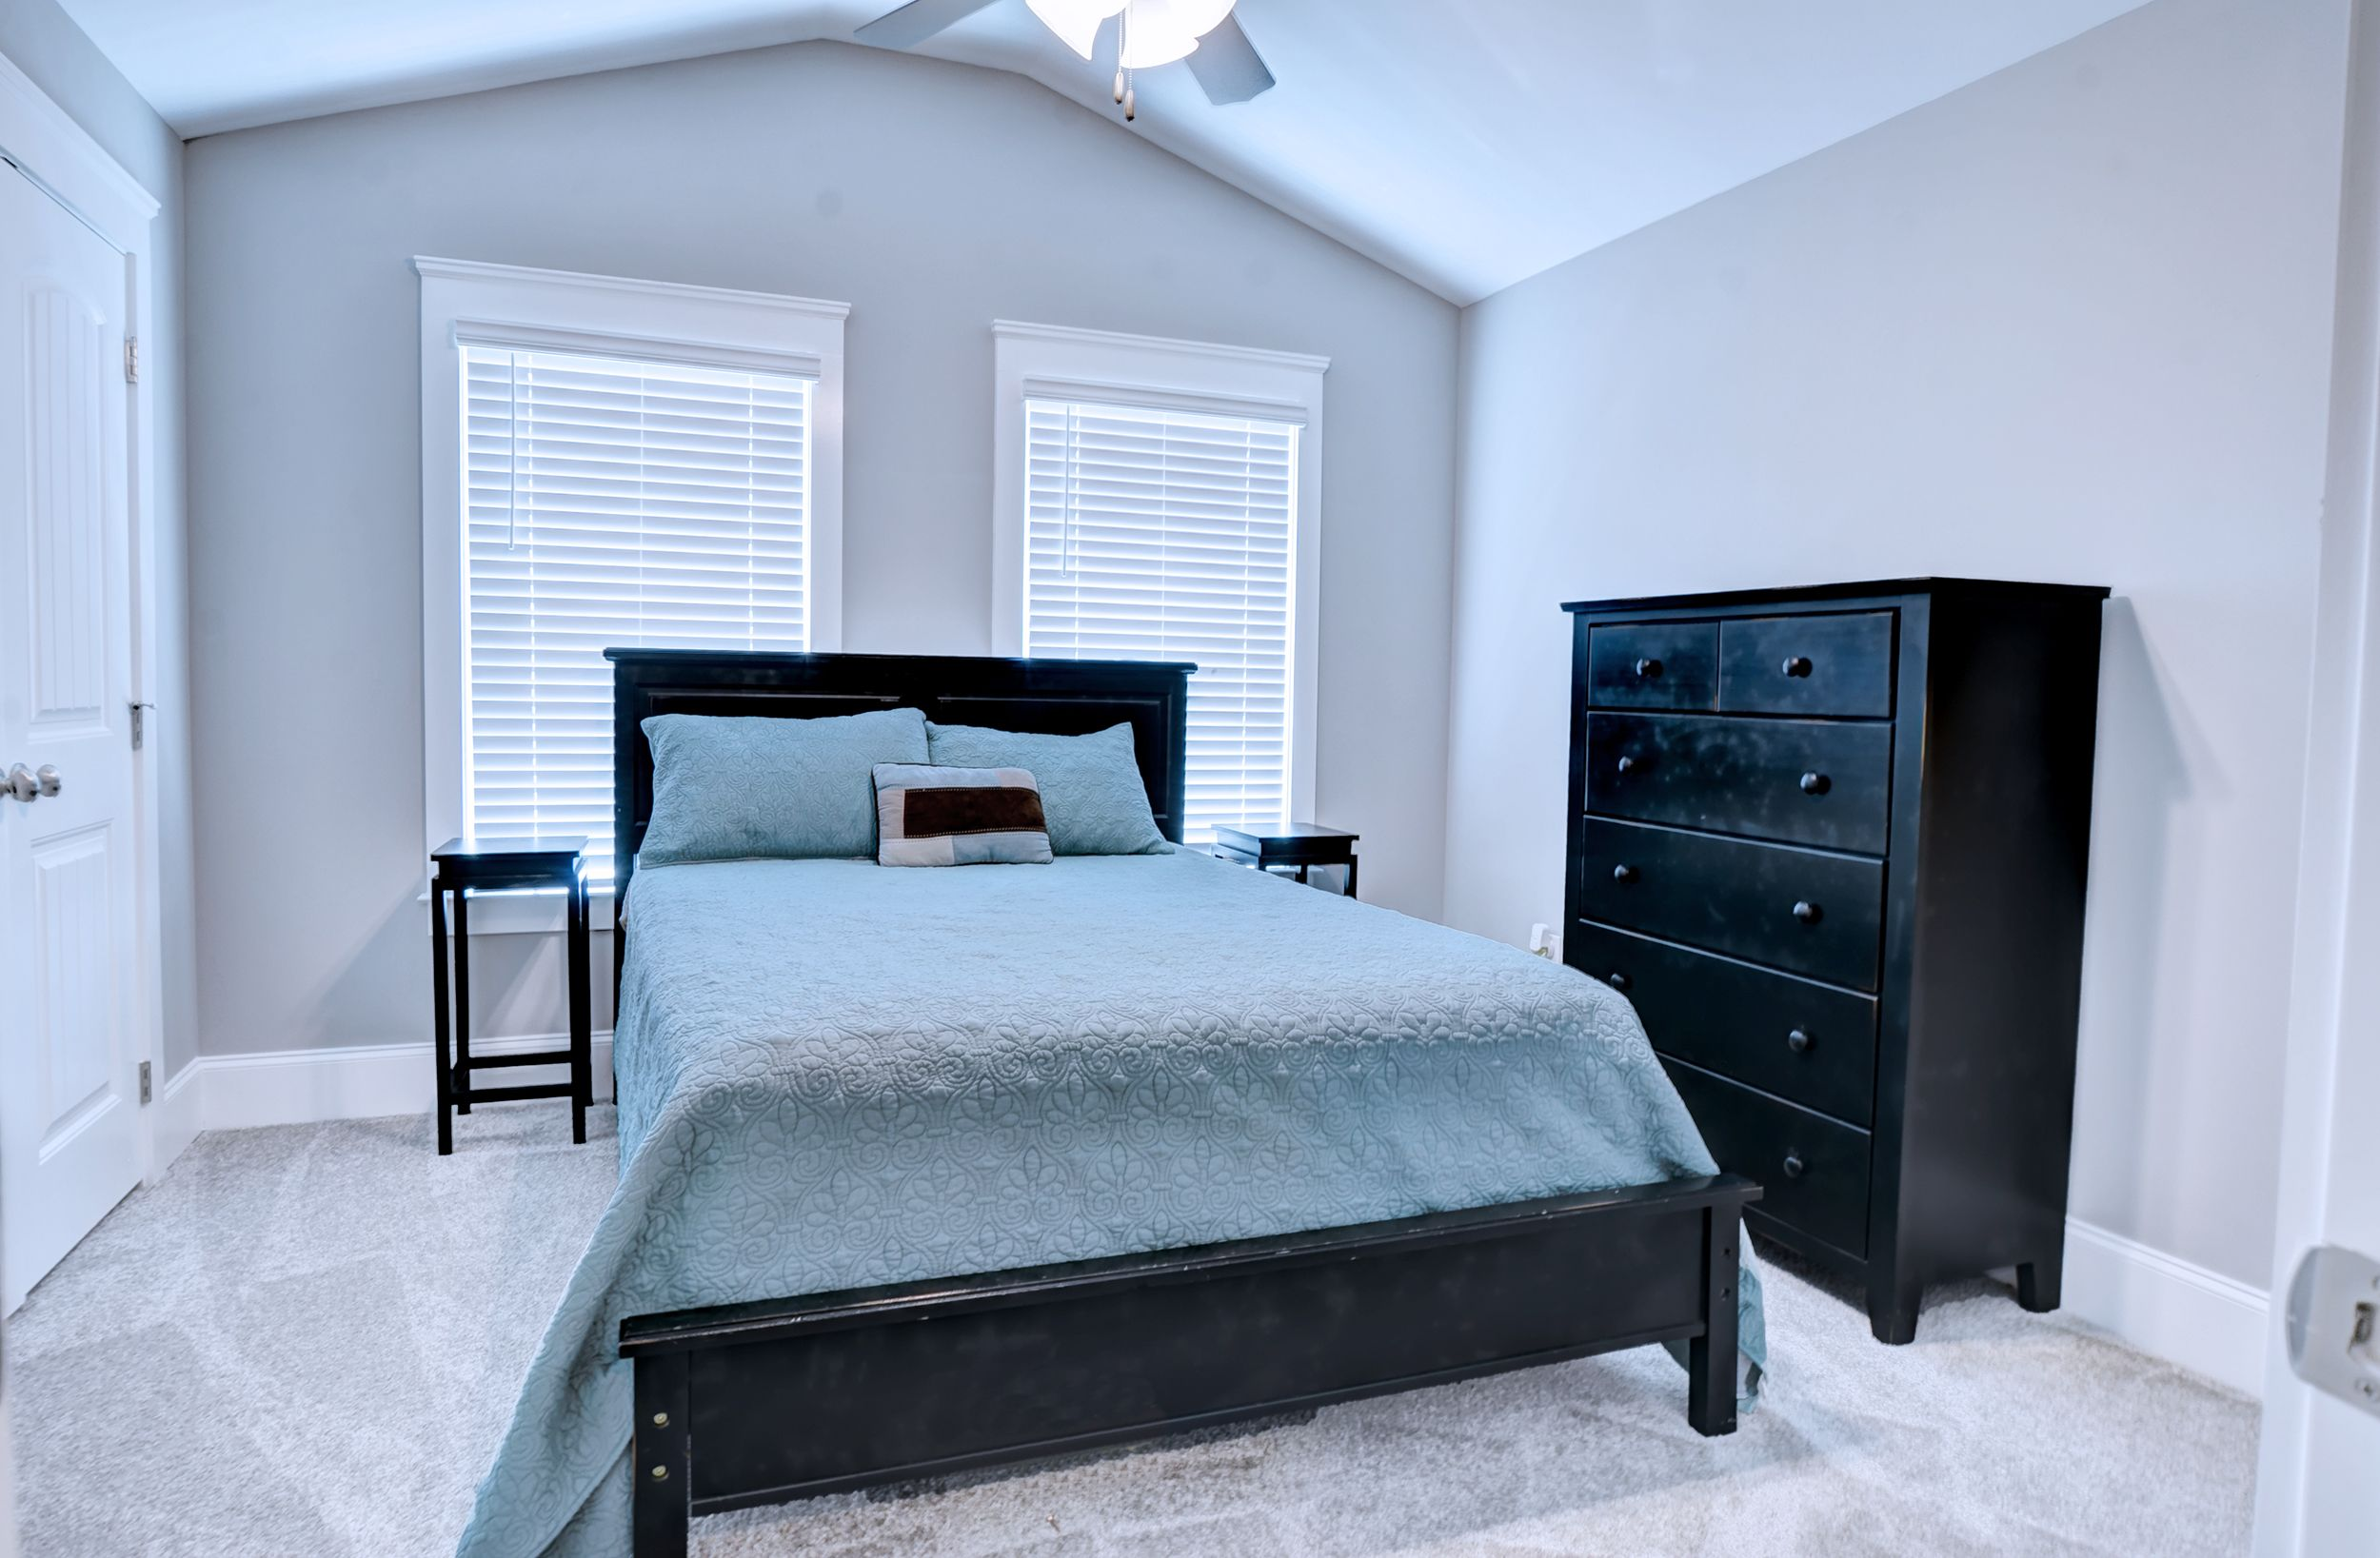 Bedroom featured in the Lakeland II By  NRB Properties, LLC in Montgomery, AL